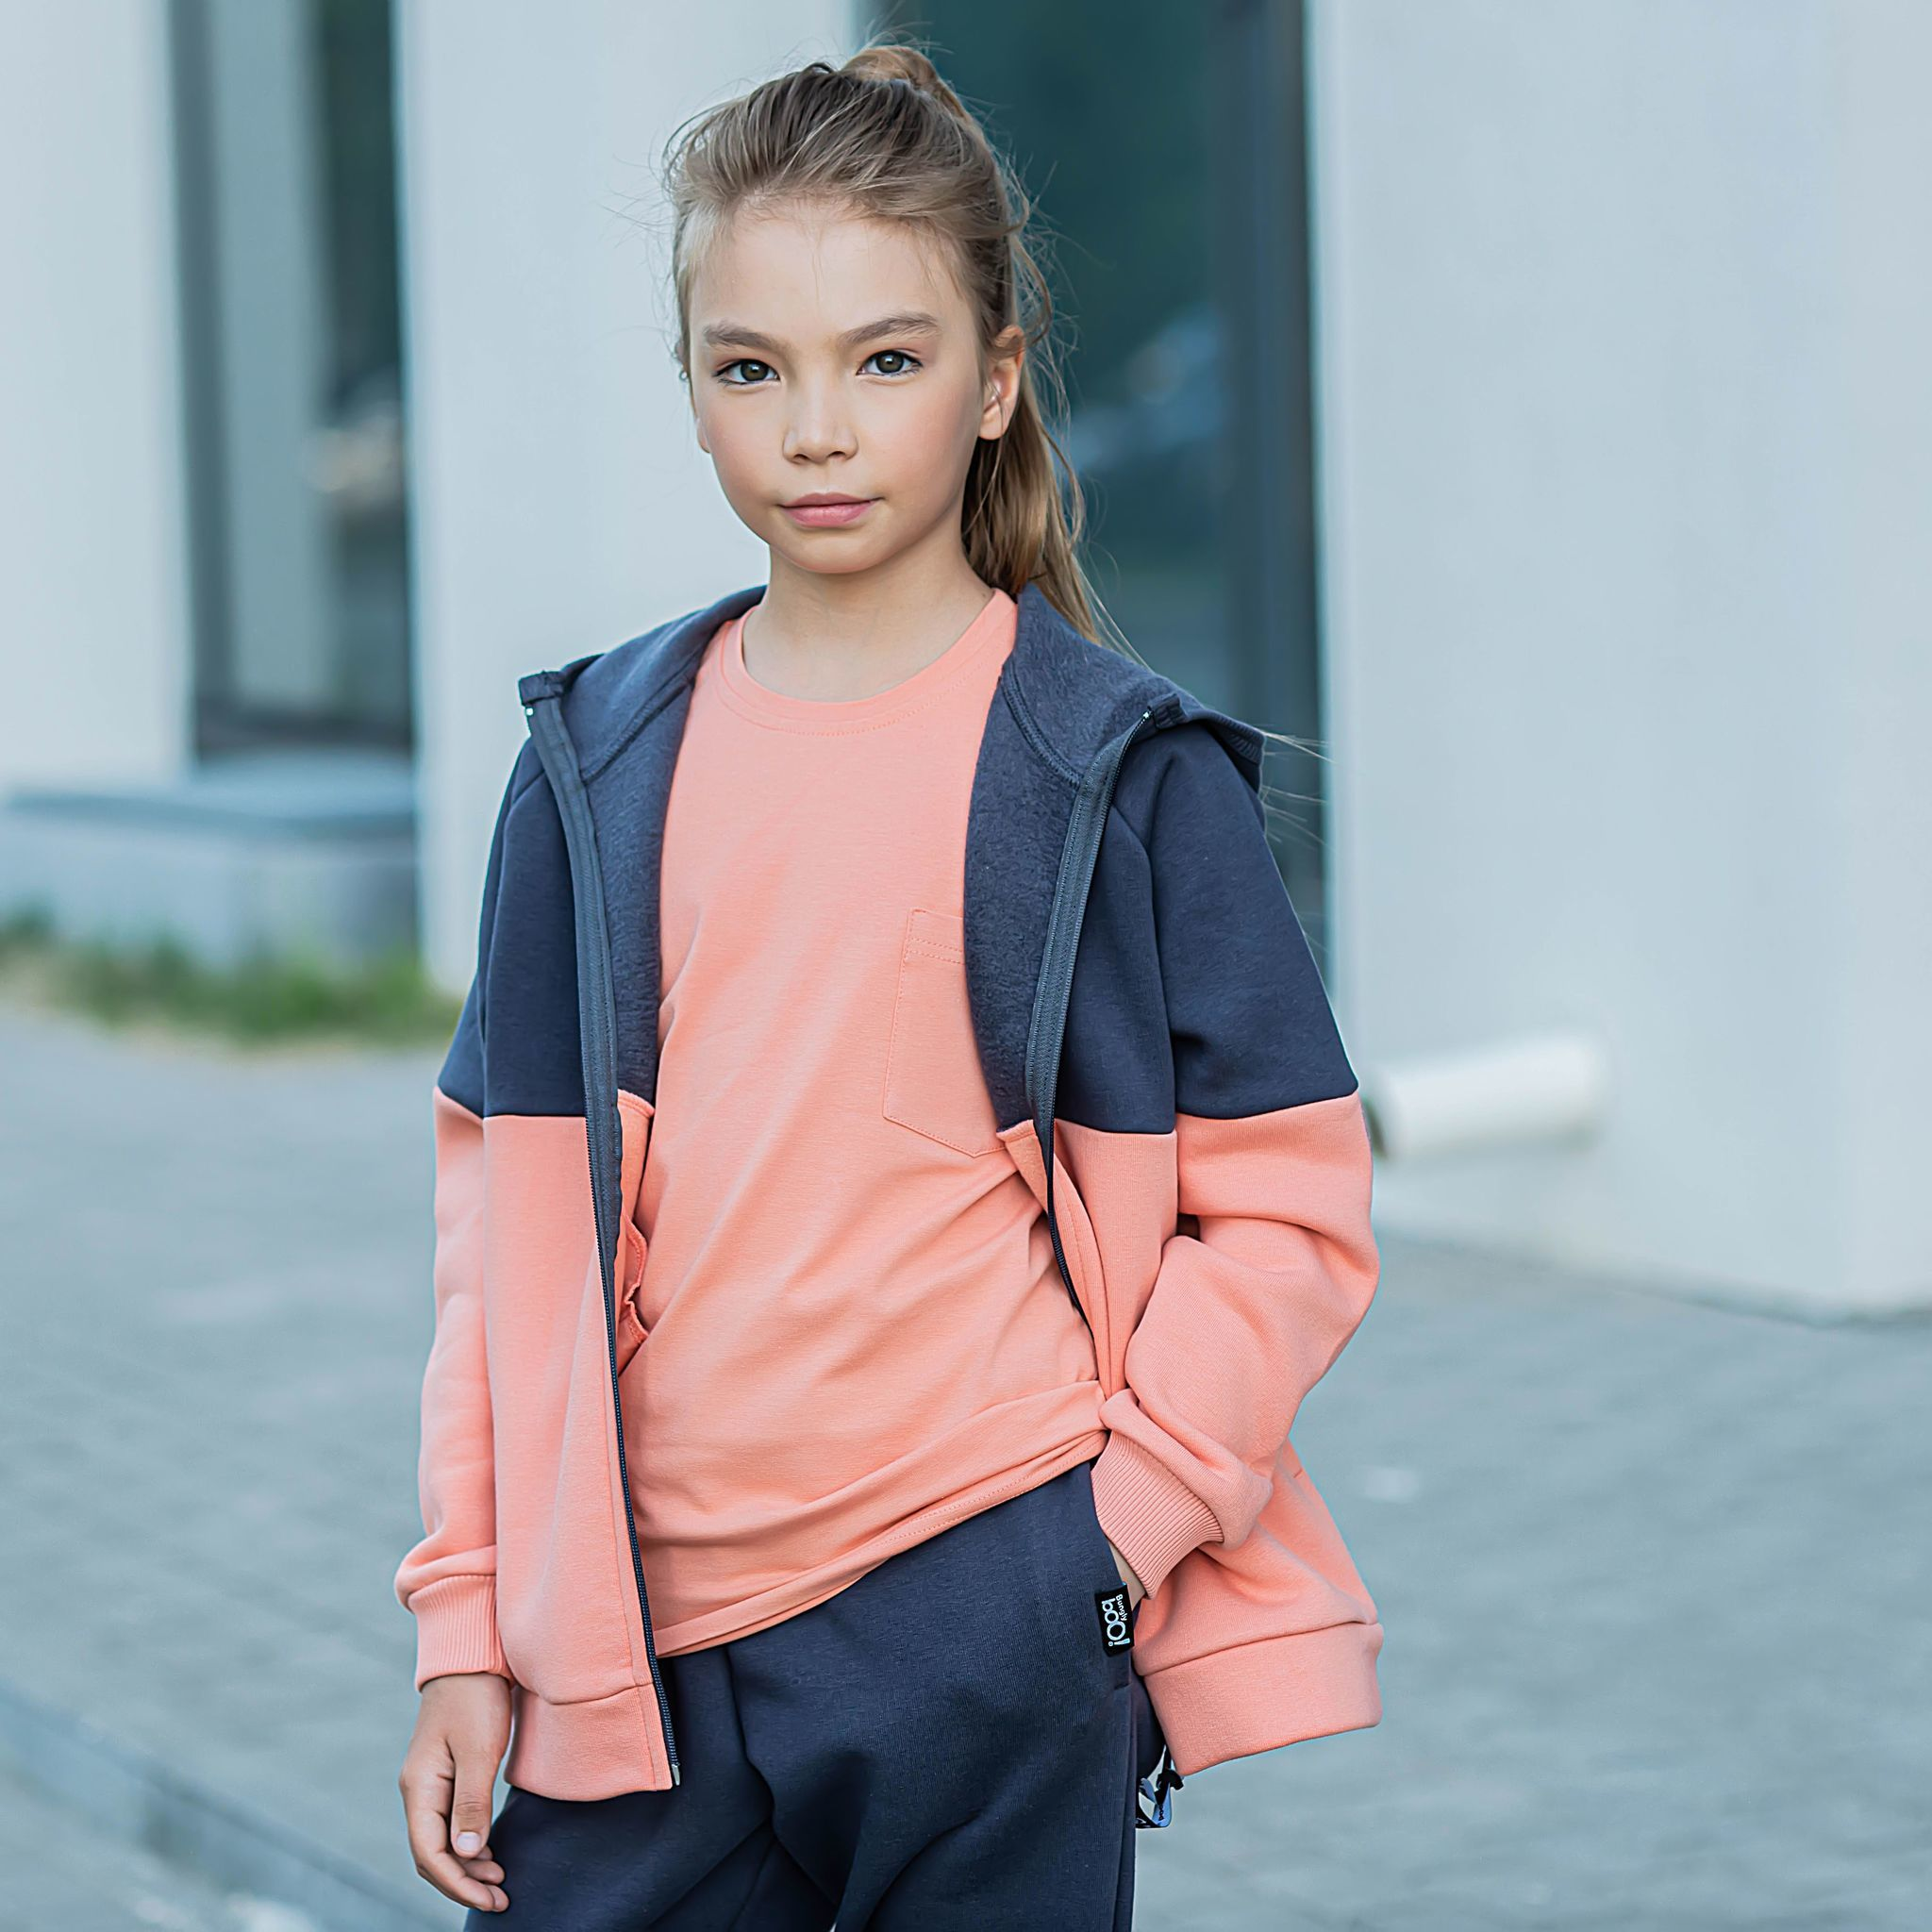 Color block warm sweatshirt for teens - Graphite/Coral